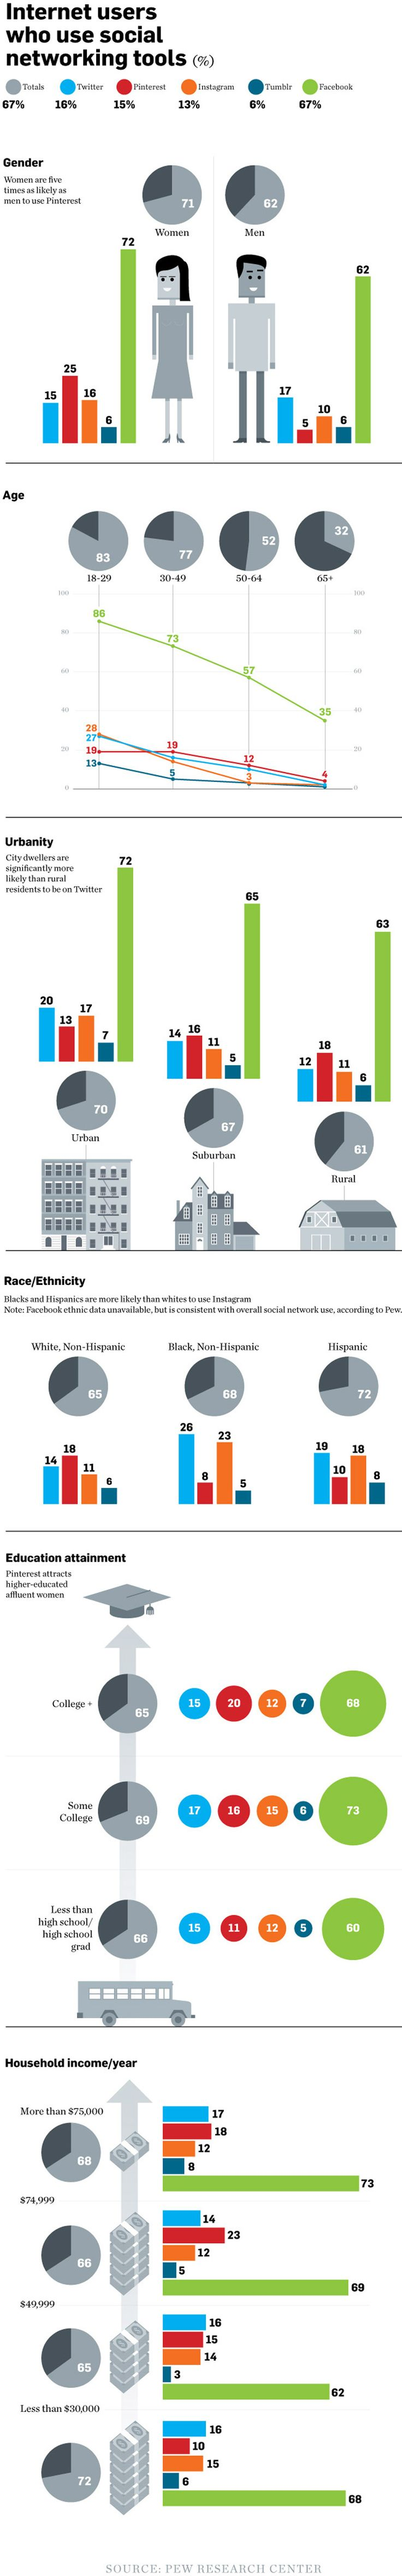 Social Media 2013 User Demographics - infographic